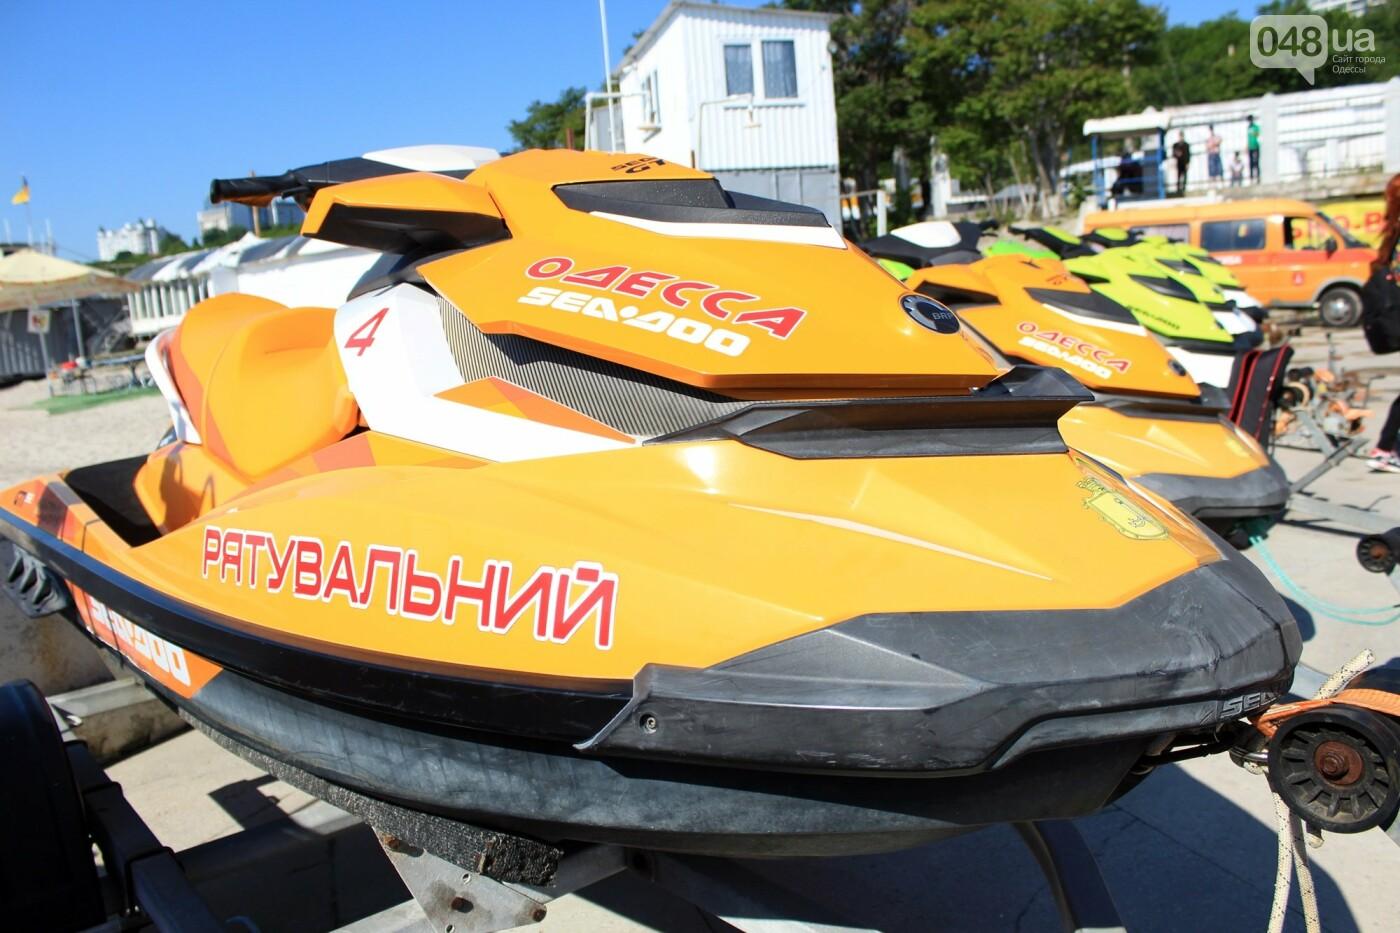 Школьники спасали утопающих: на Ланжероне в Одессе провели учения, - ФОТО, ВИДЕО , фото-11